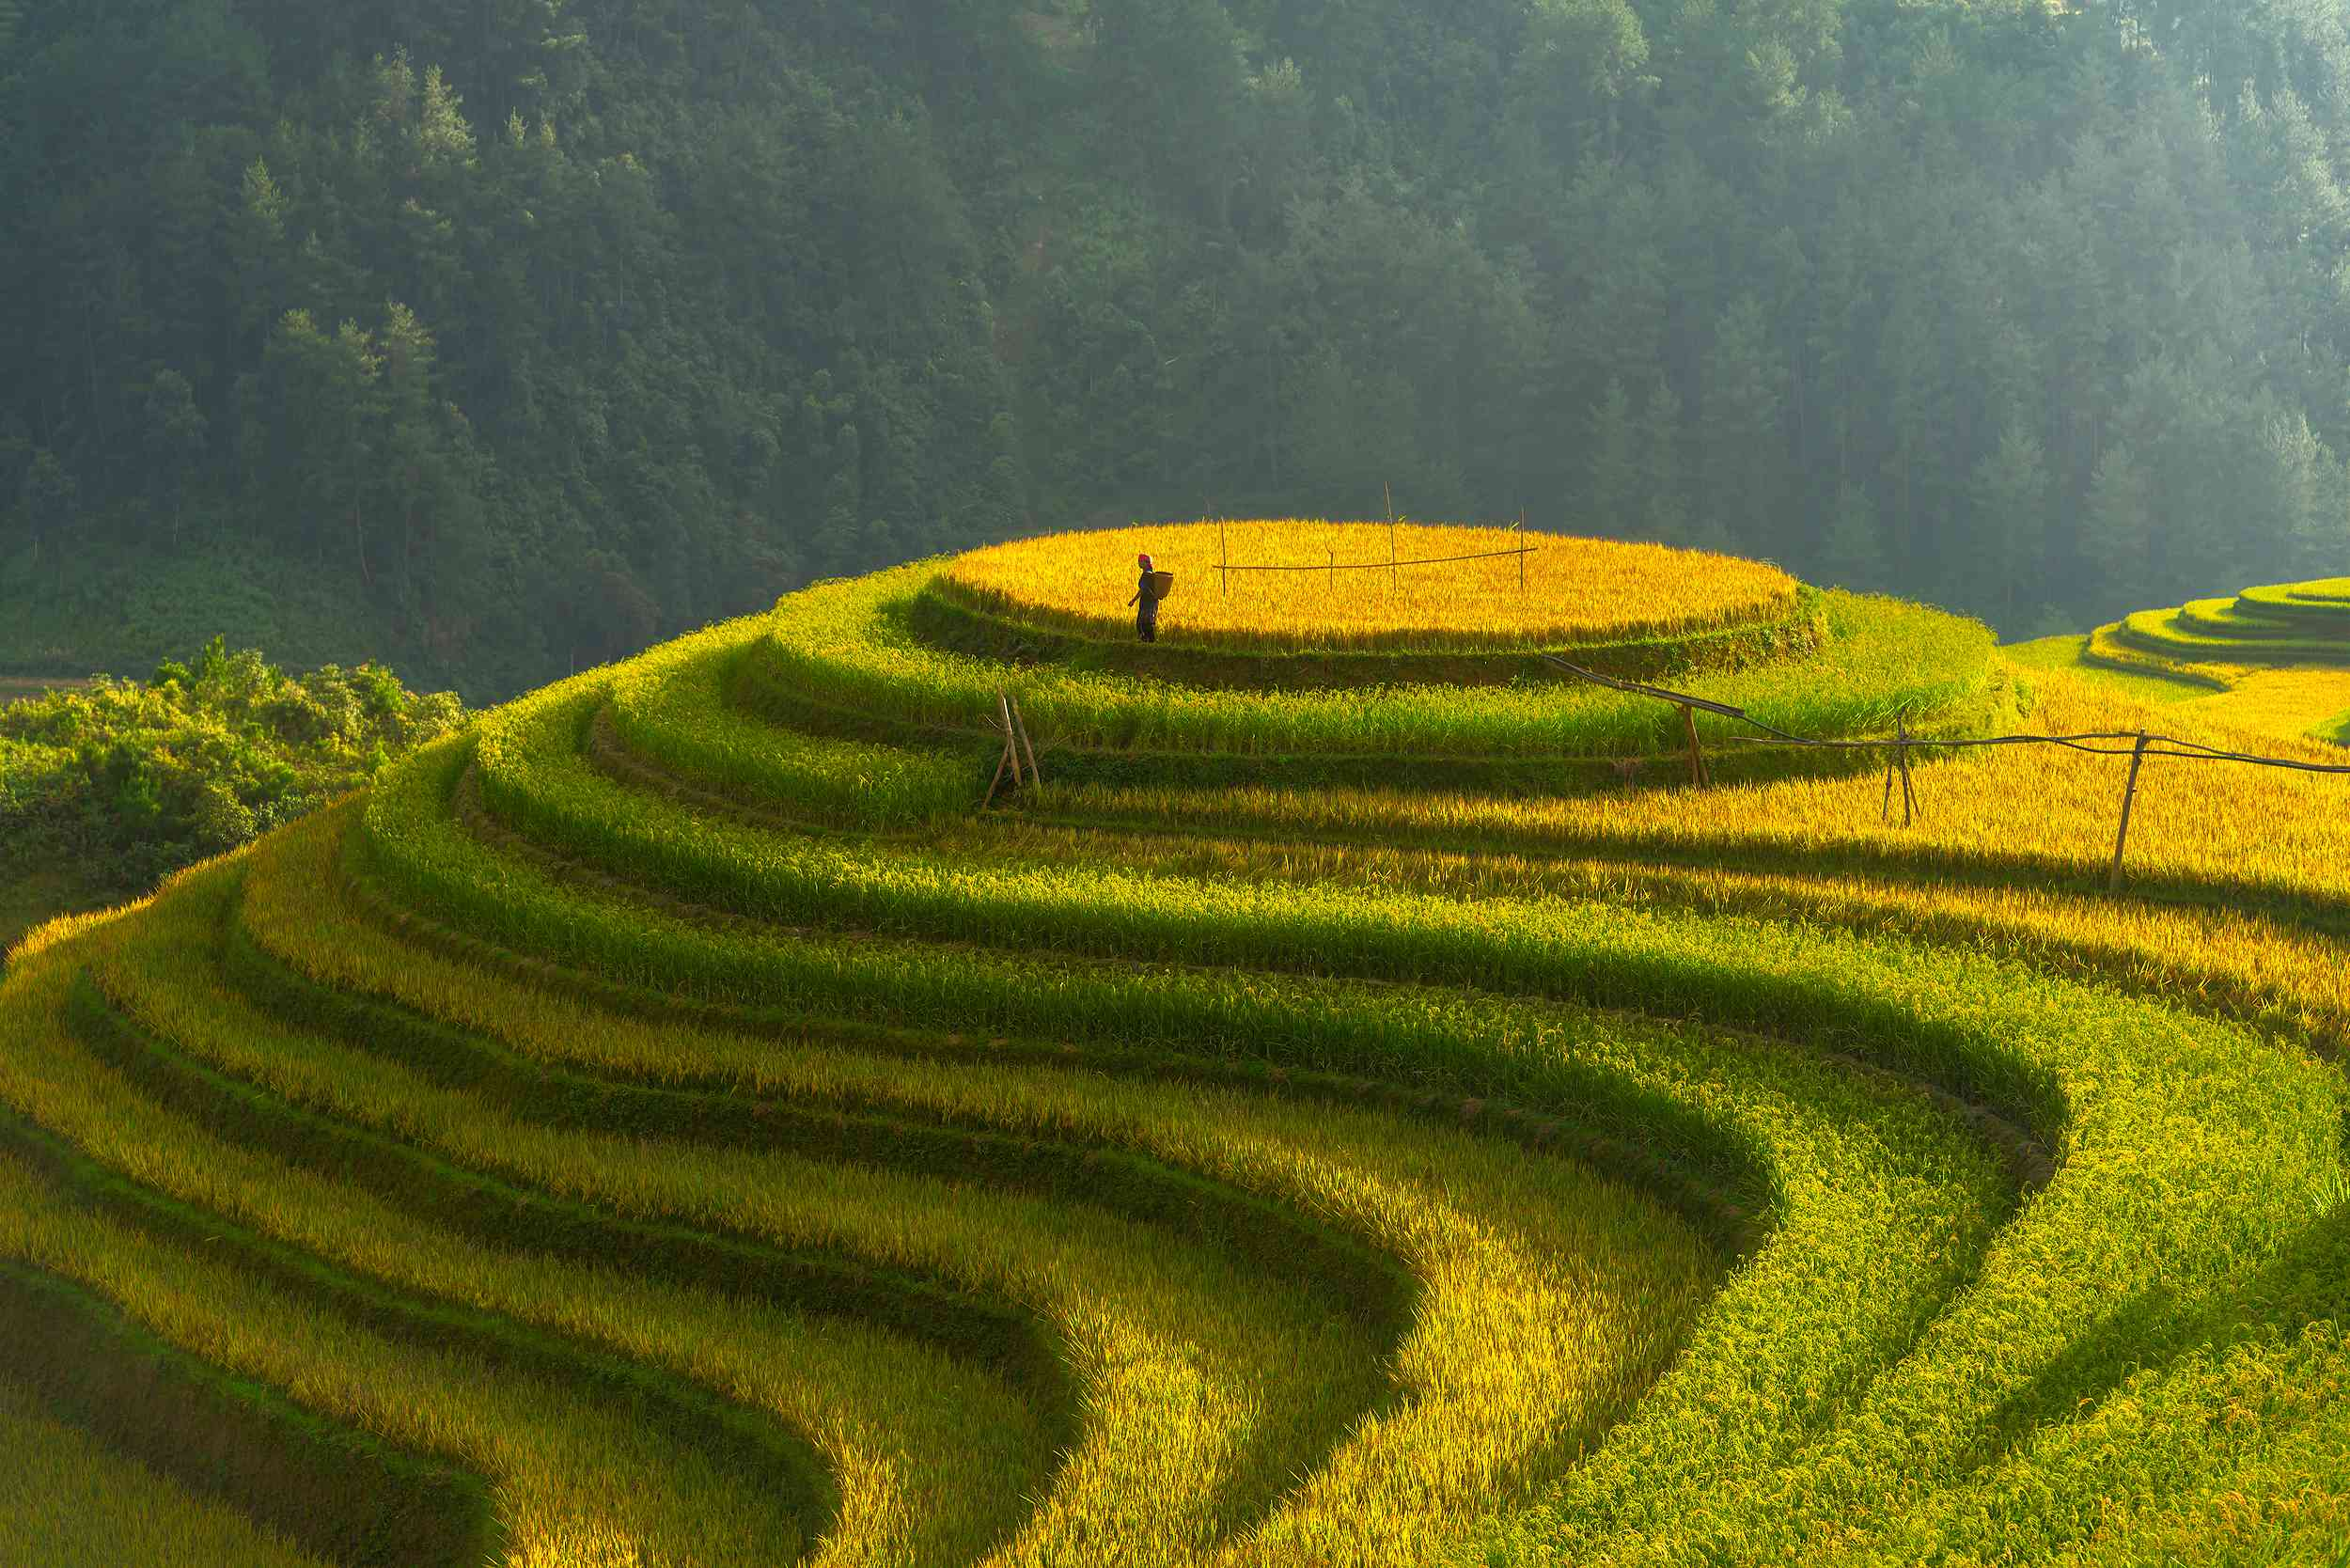 Contour rice farming in Yên Bái Province, Vietnam.